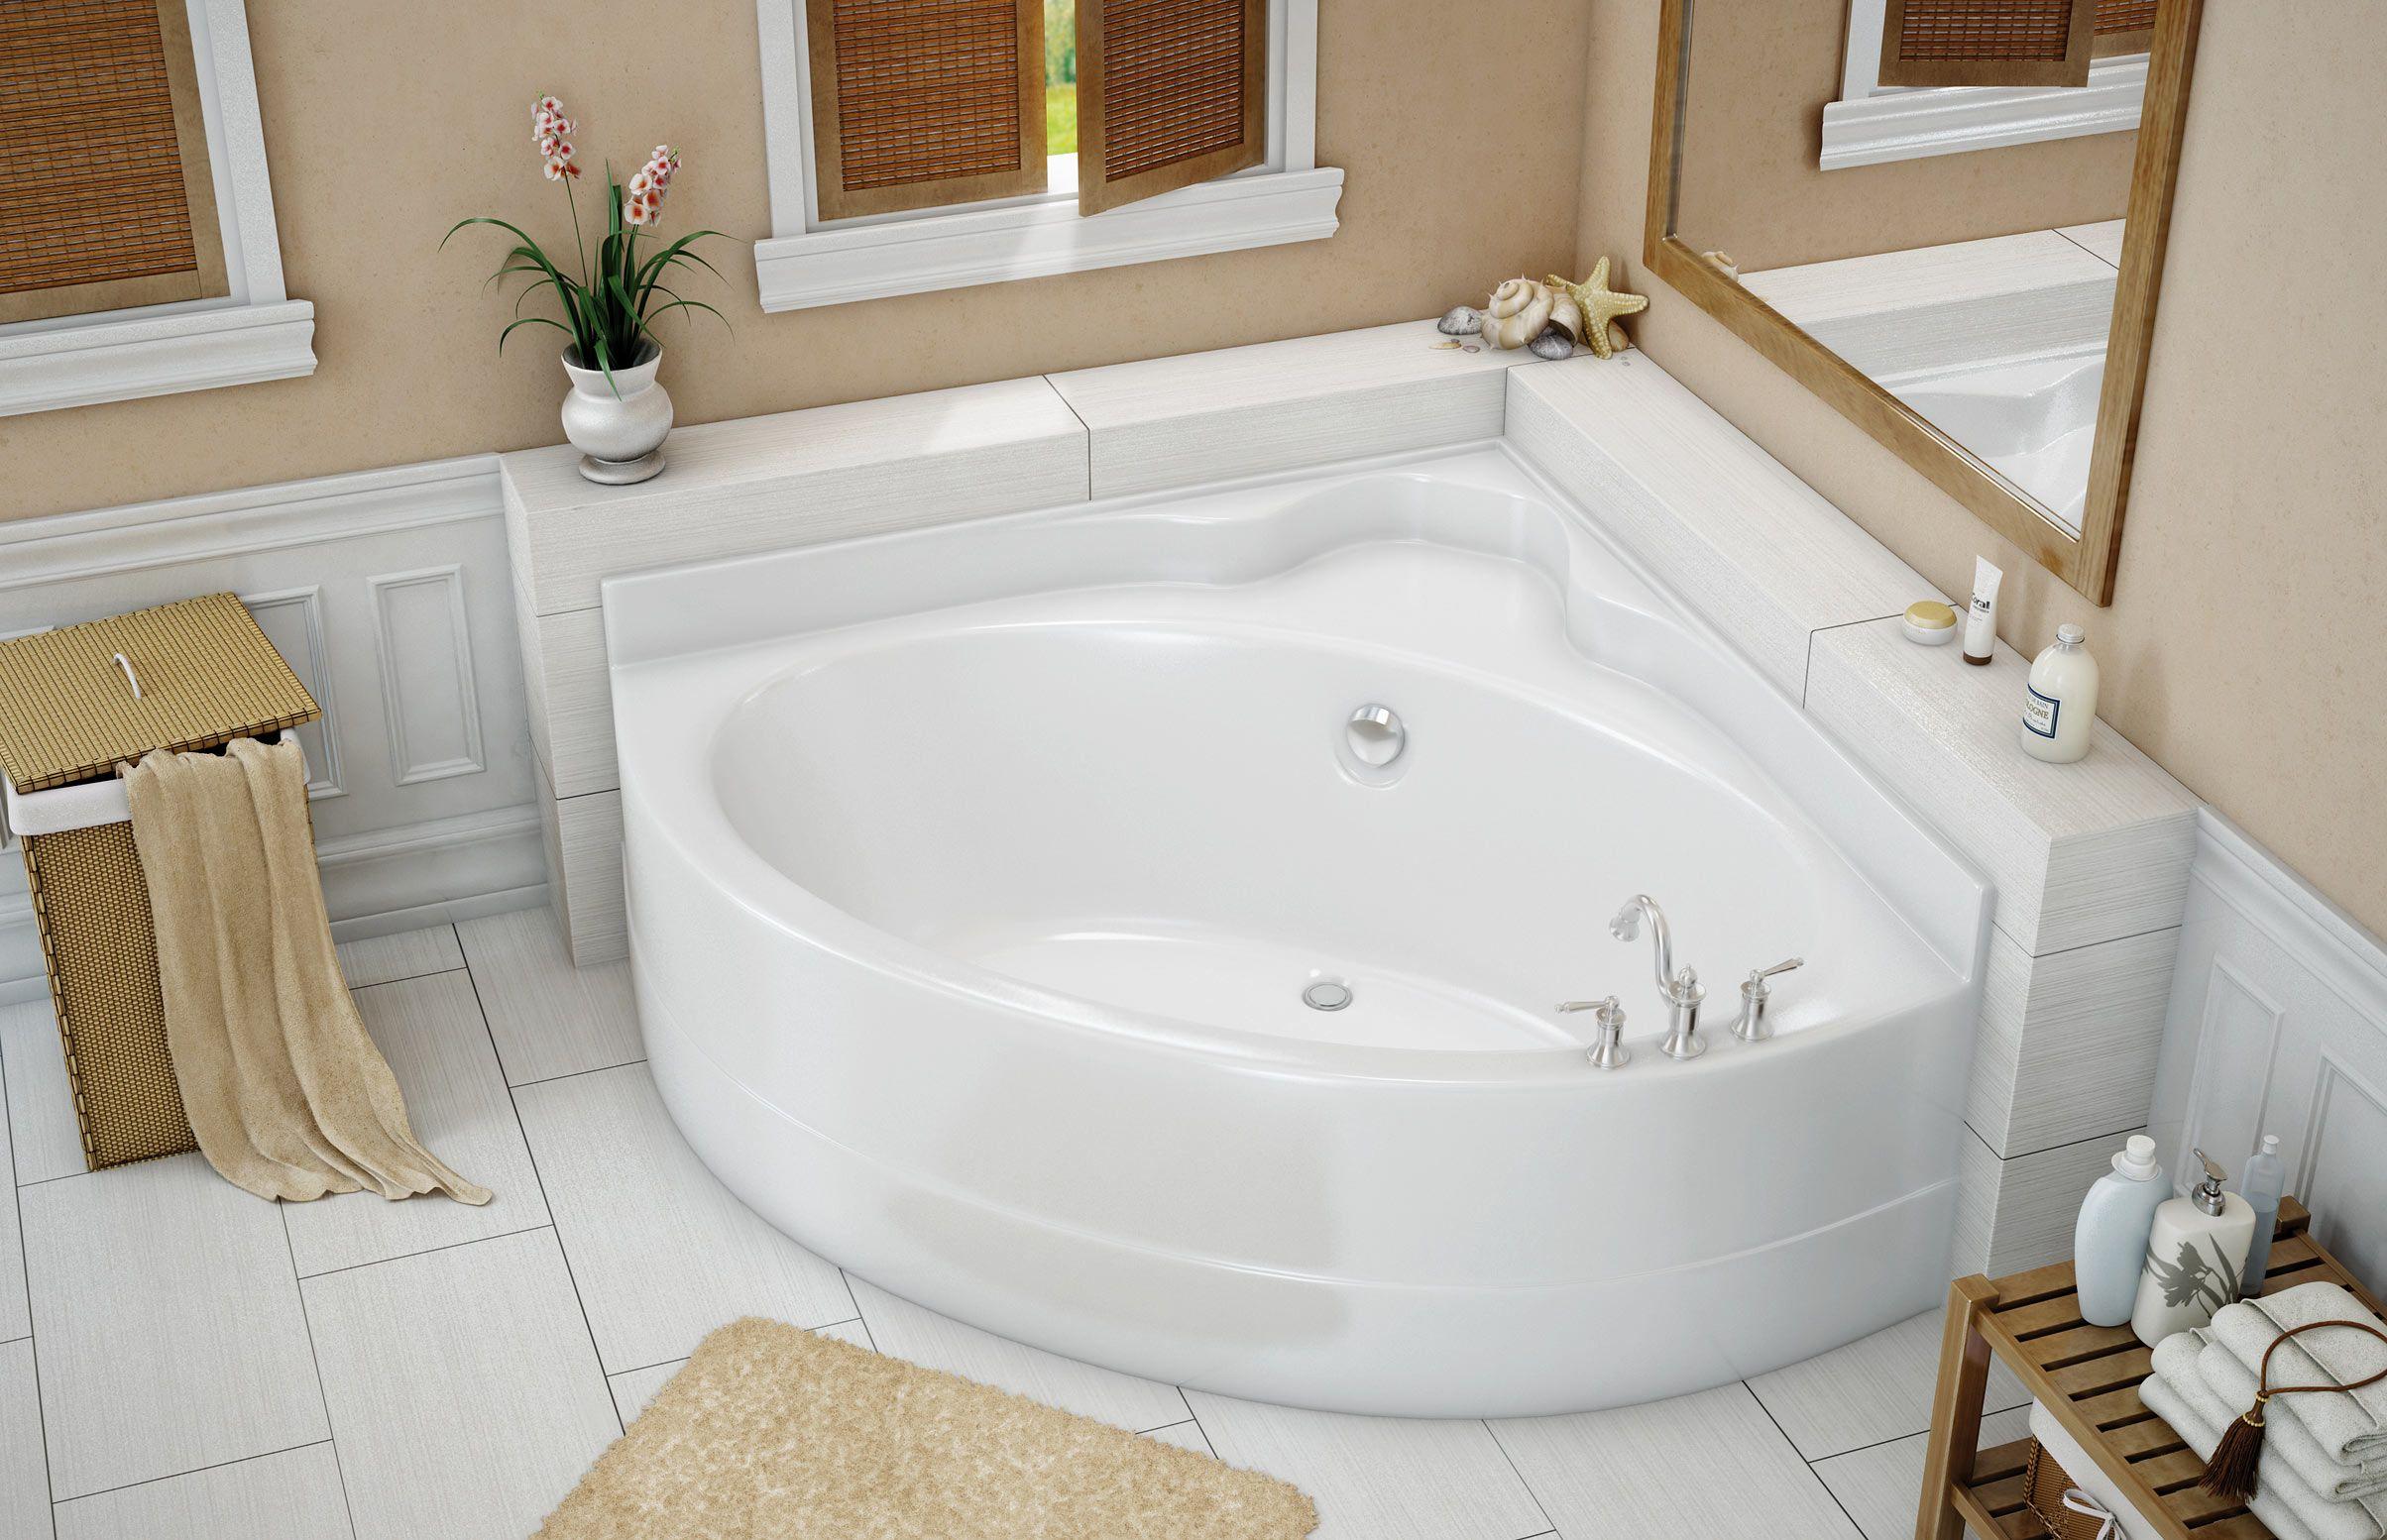 Vo5050 5 Ft Corner Bathtub Maax Professional Banos Pequenos Banera Para Bano Pequeno Diseno De Interiores De Bano